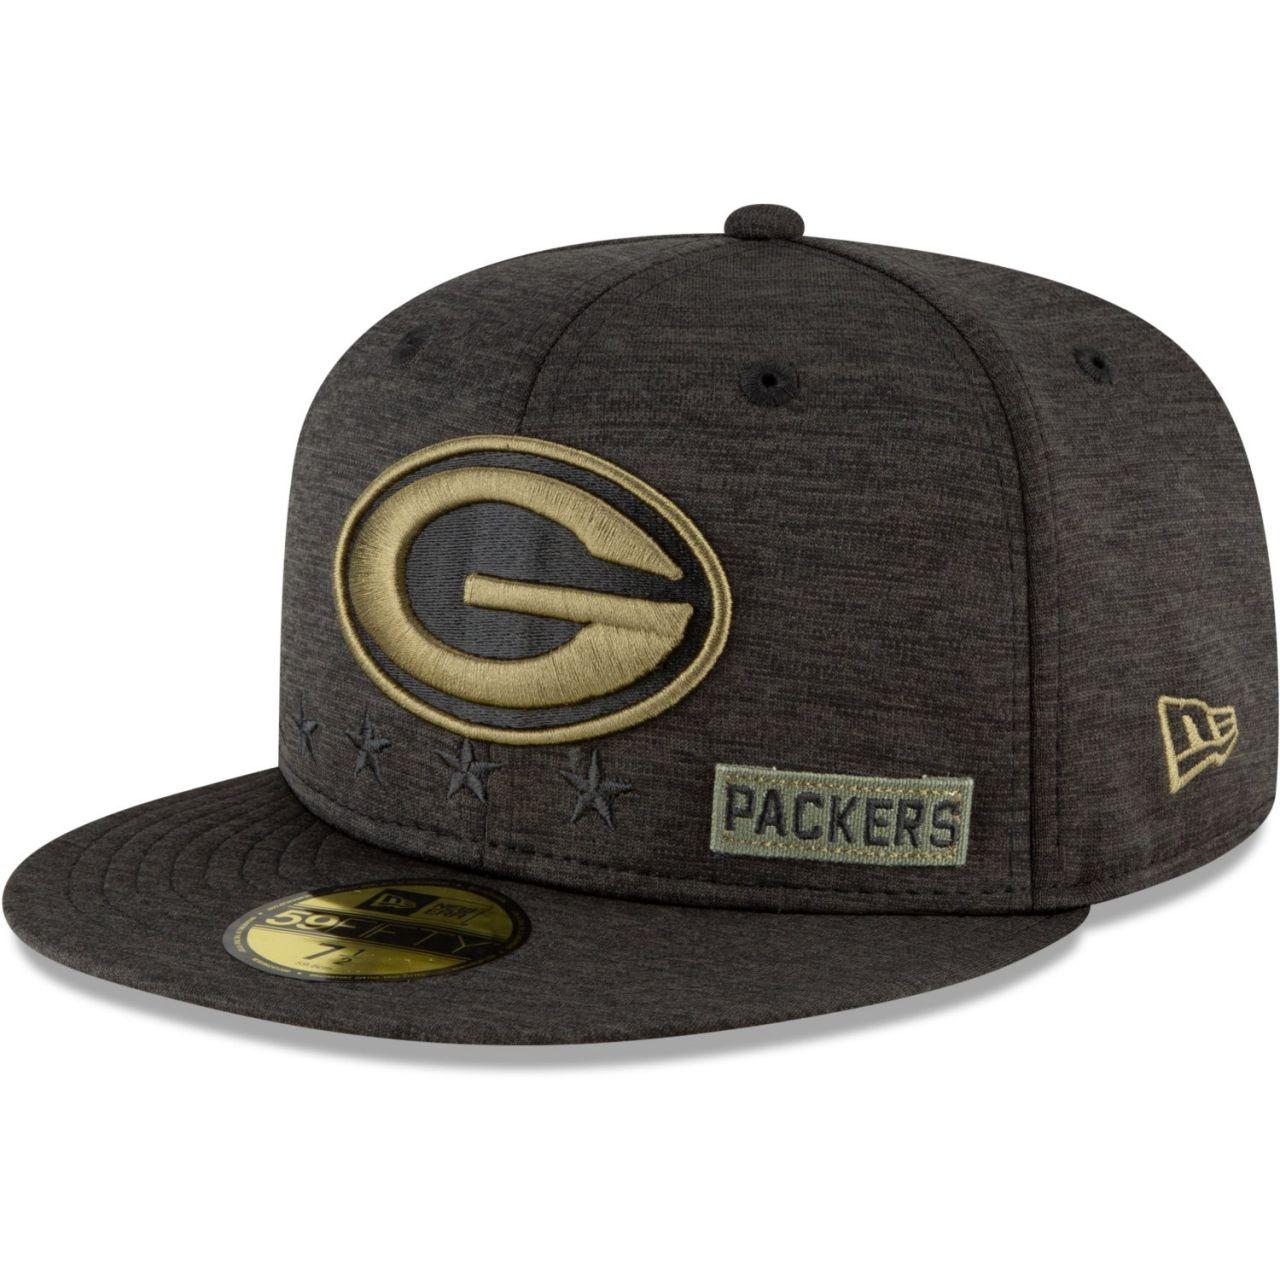 amfoo - New Era 59FIFTY Cap Salute to Service NFL Green Bay Packers